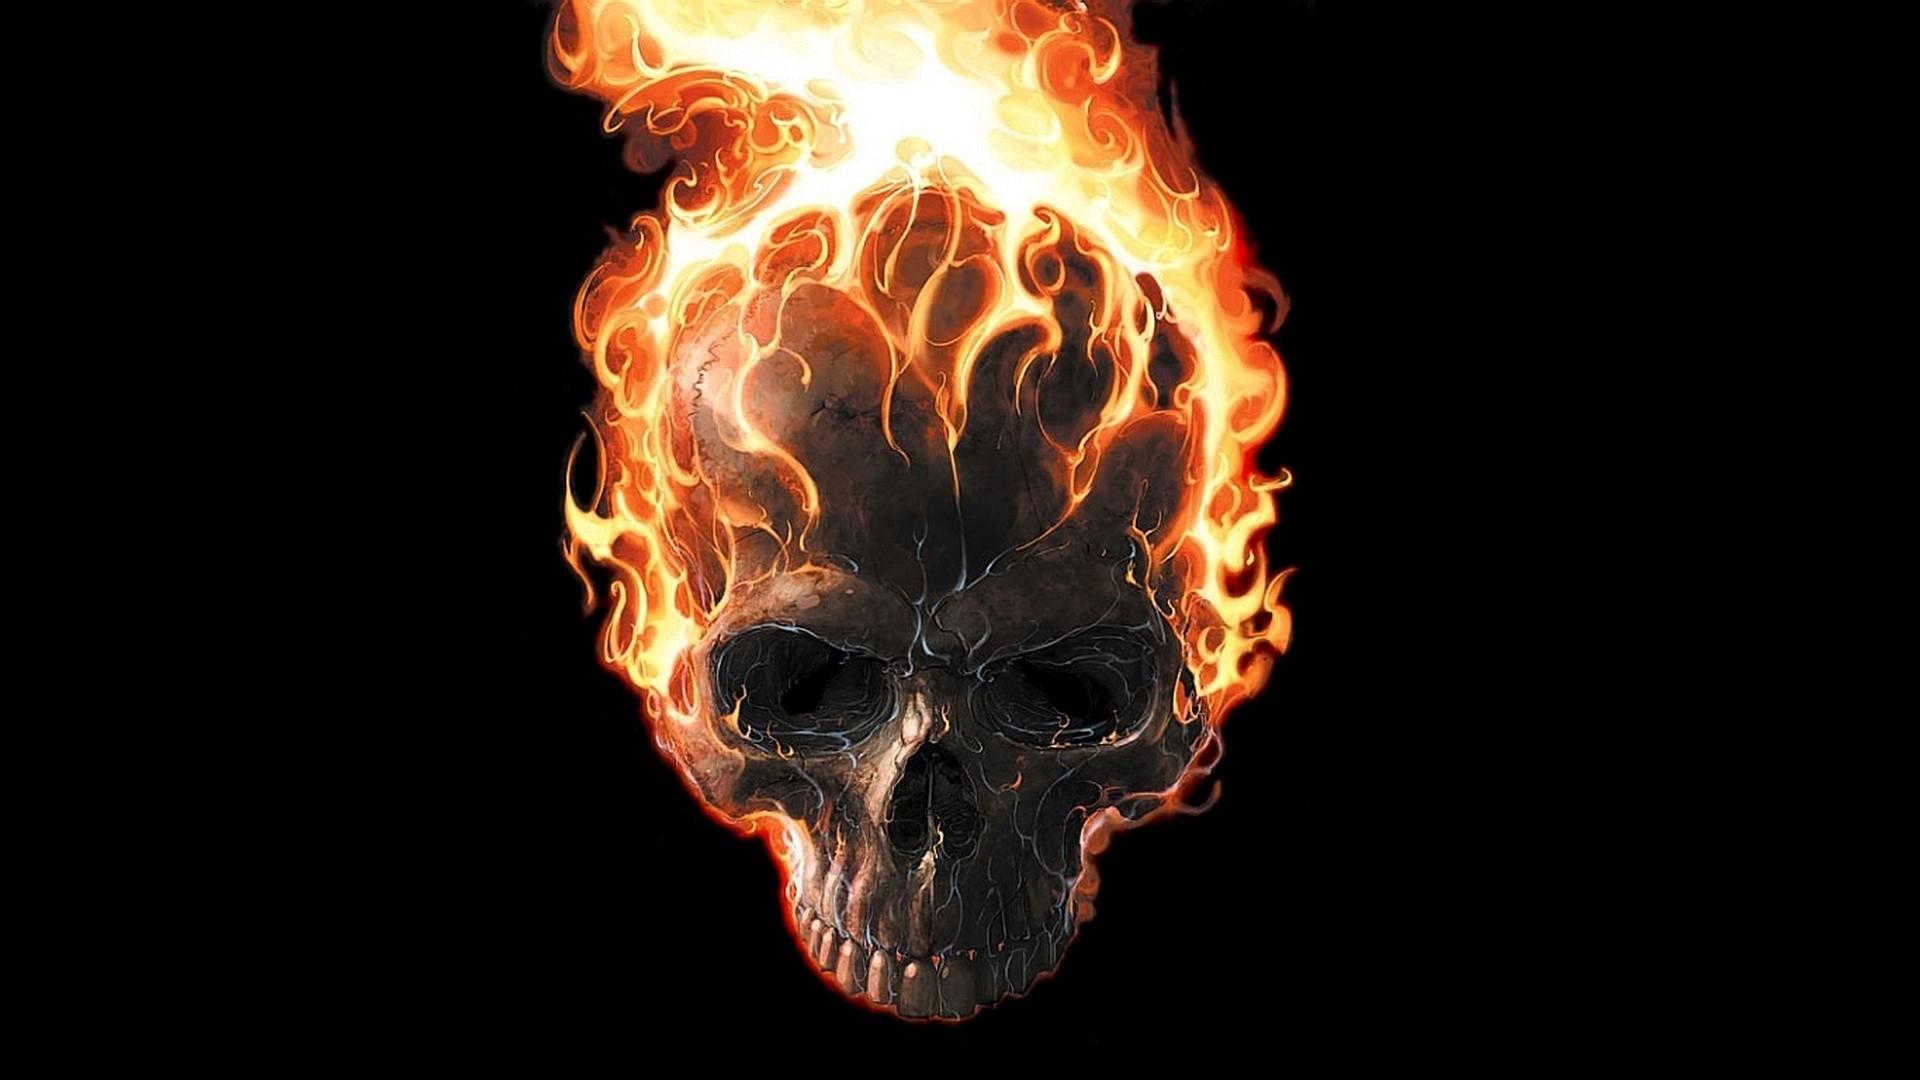 Digital Art Black Background Minimalism Movie Poster Fire Marvel Comics Skull Teeth Ghost Rider Burning